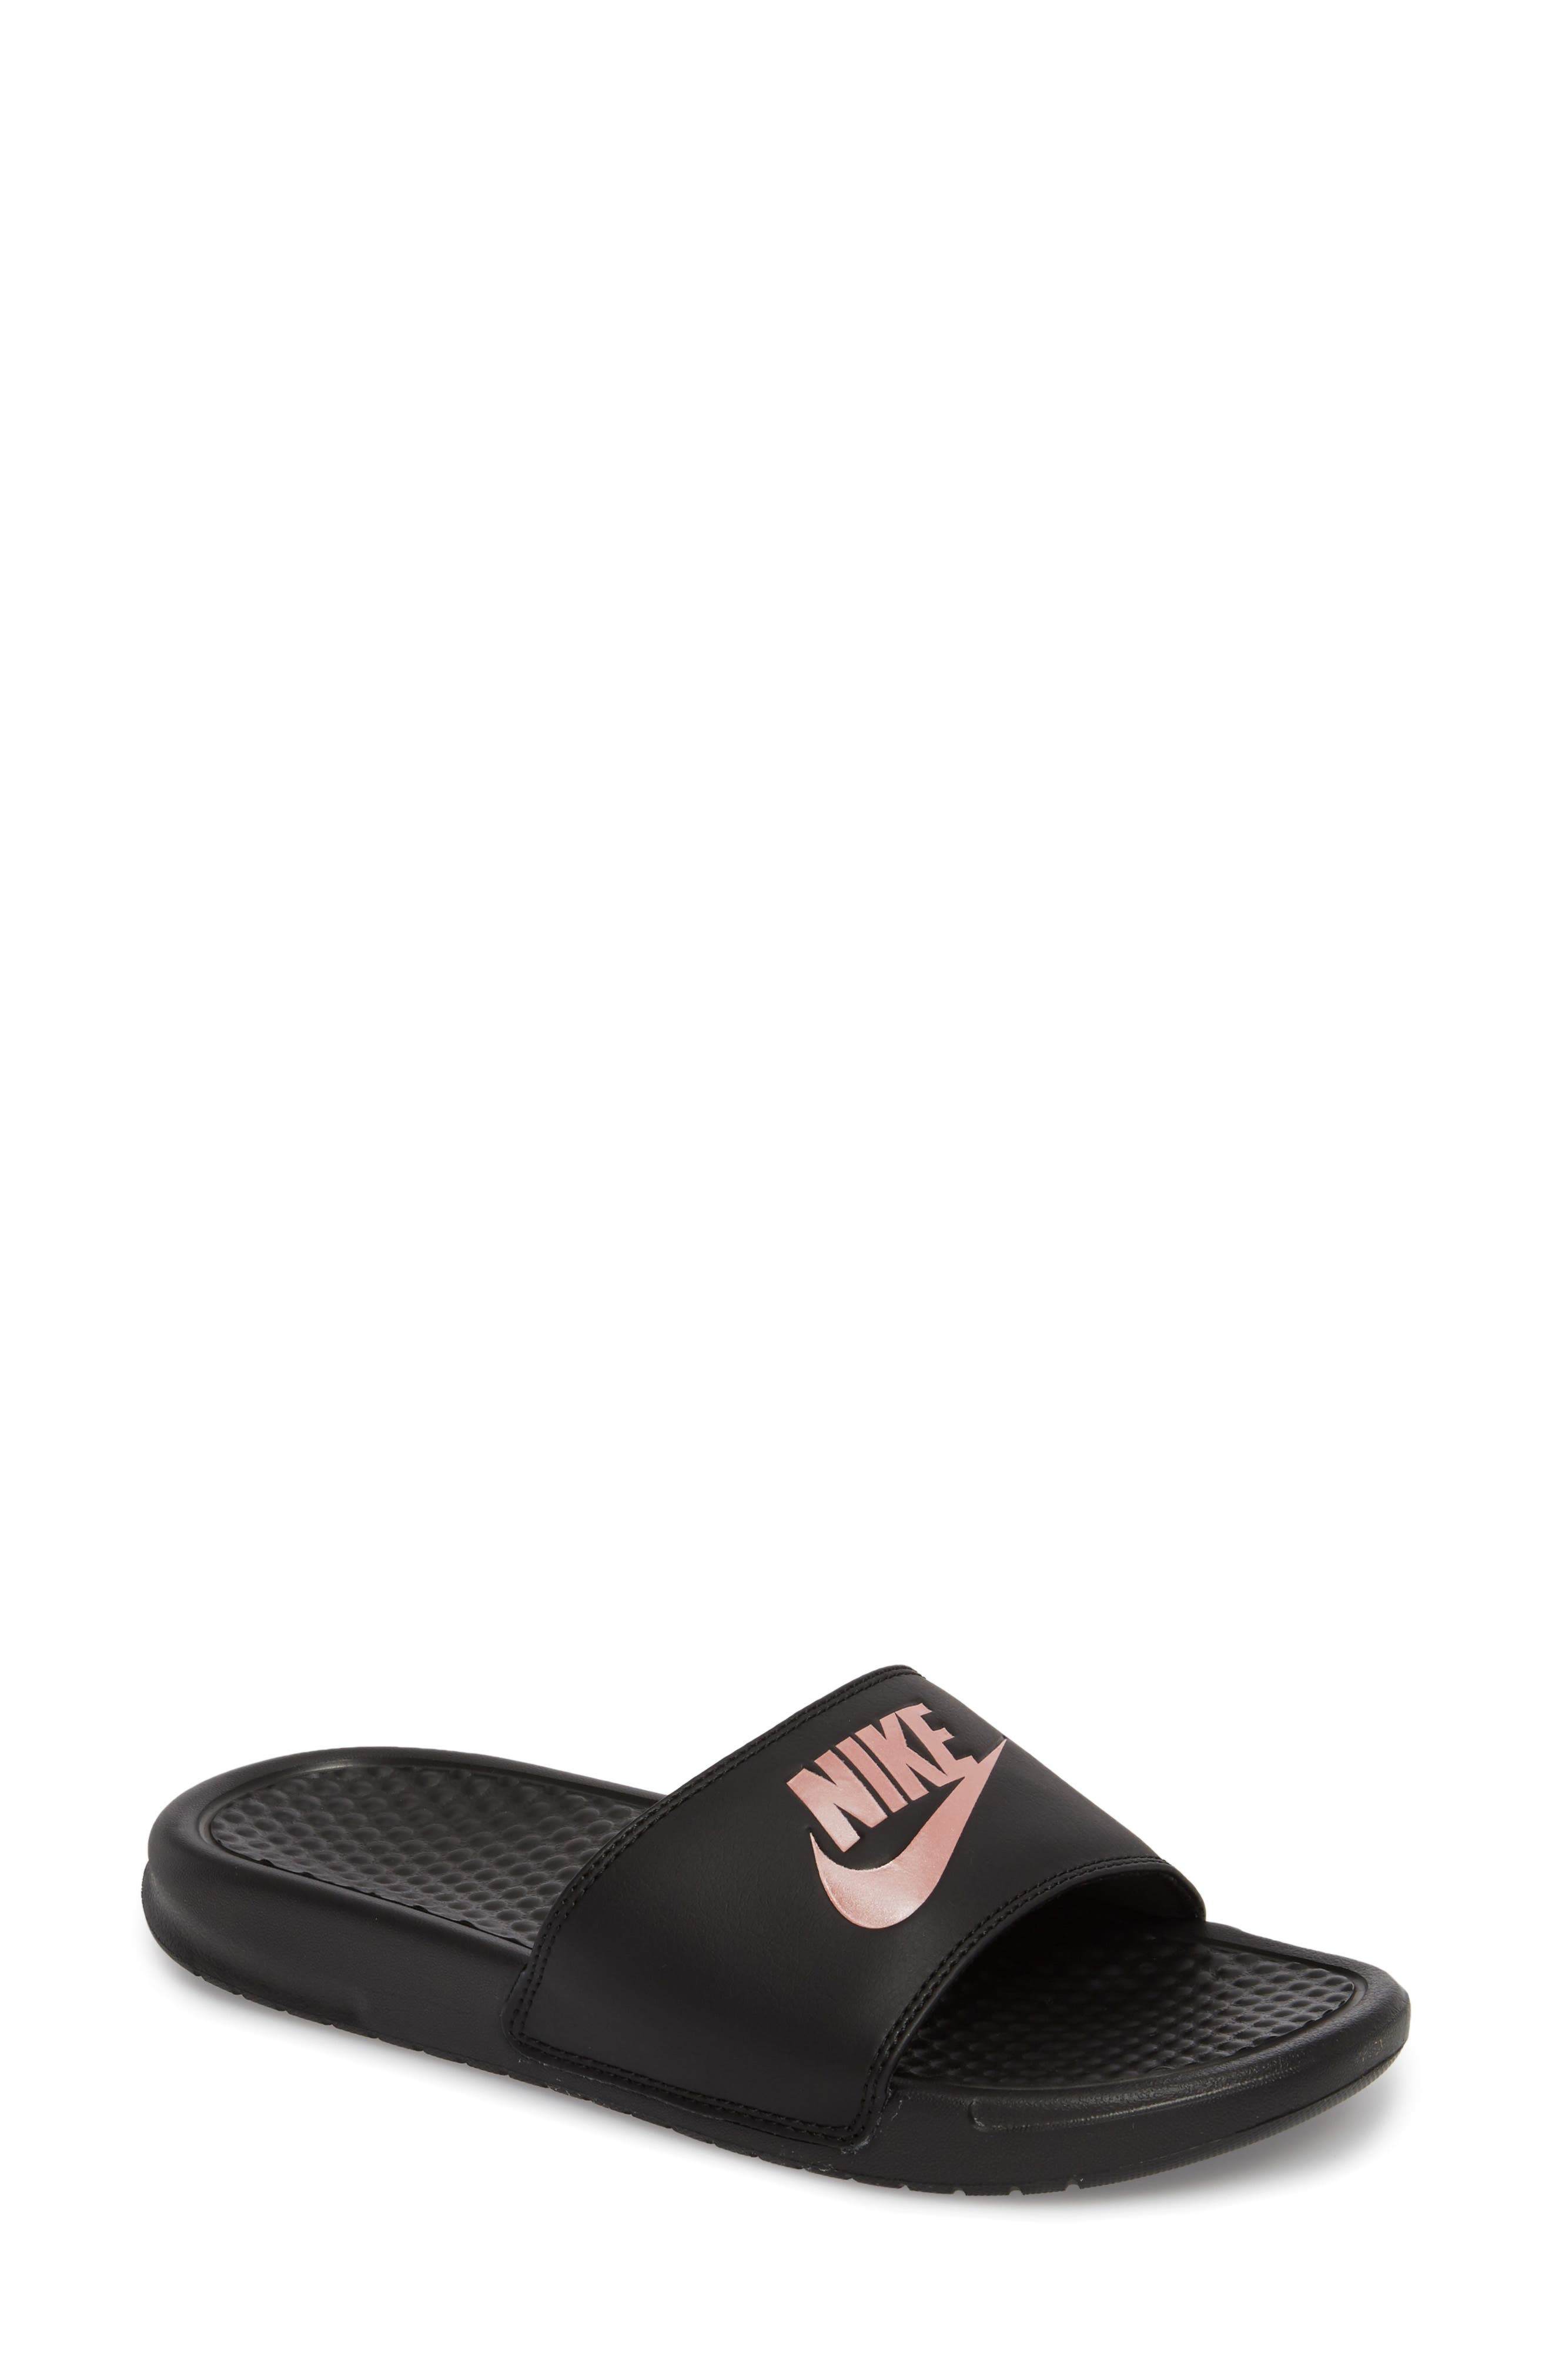 NIKE Benassi JDI Slide Sandal, Main, color, BLACK/ ROSE GOLD